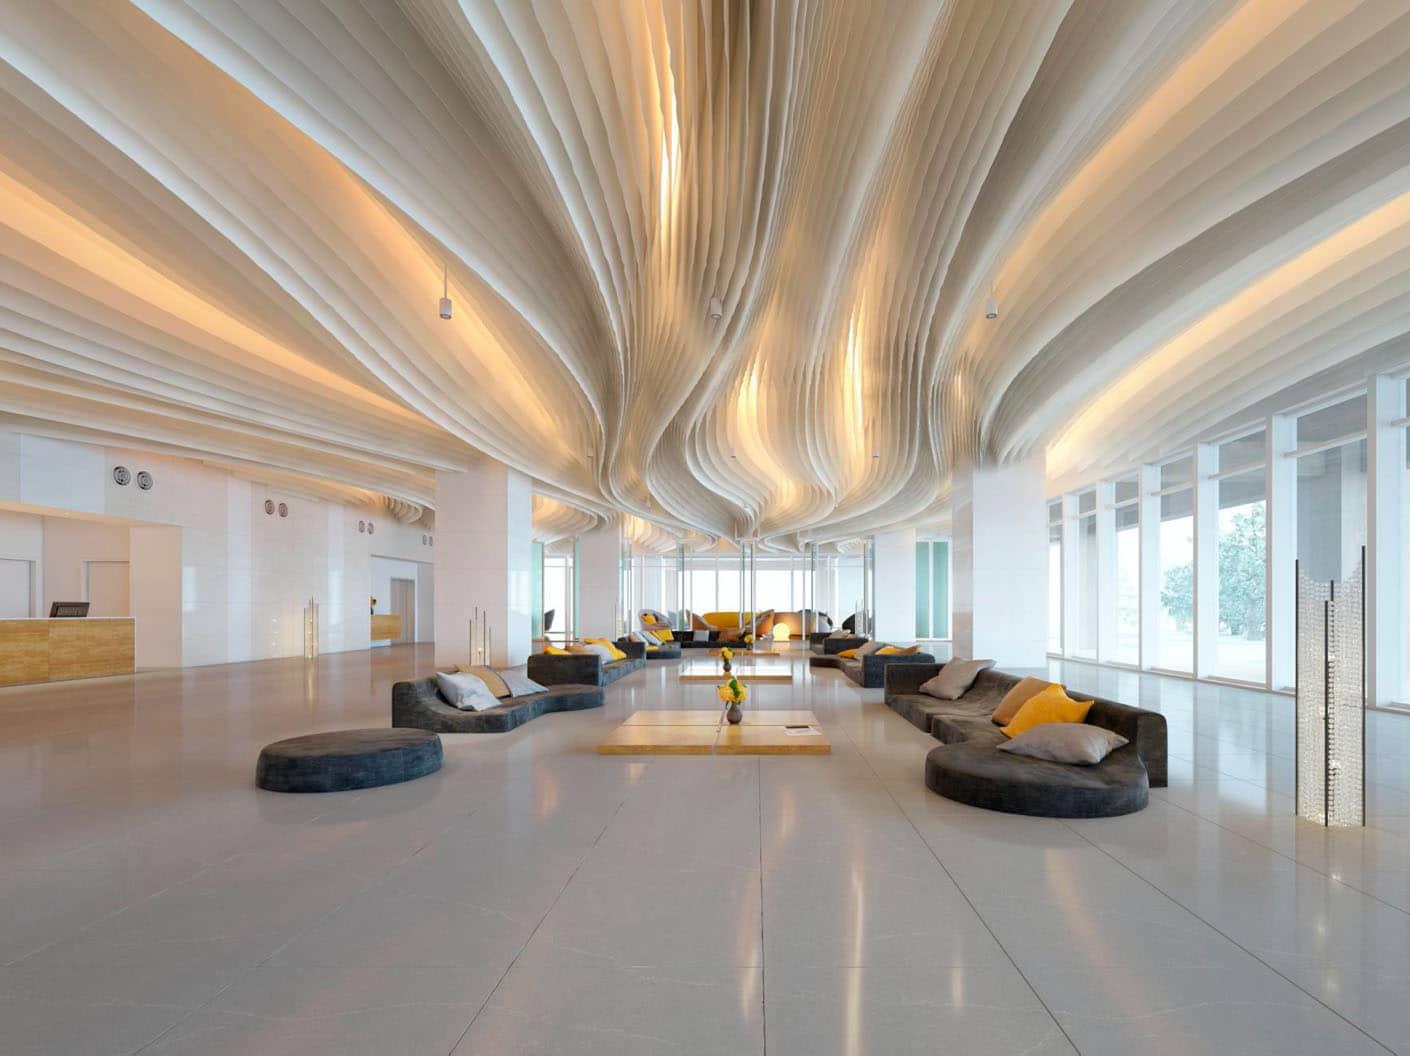 Image of 5 10 in Silestone | Flooring - Cosentino